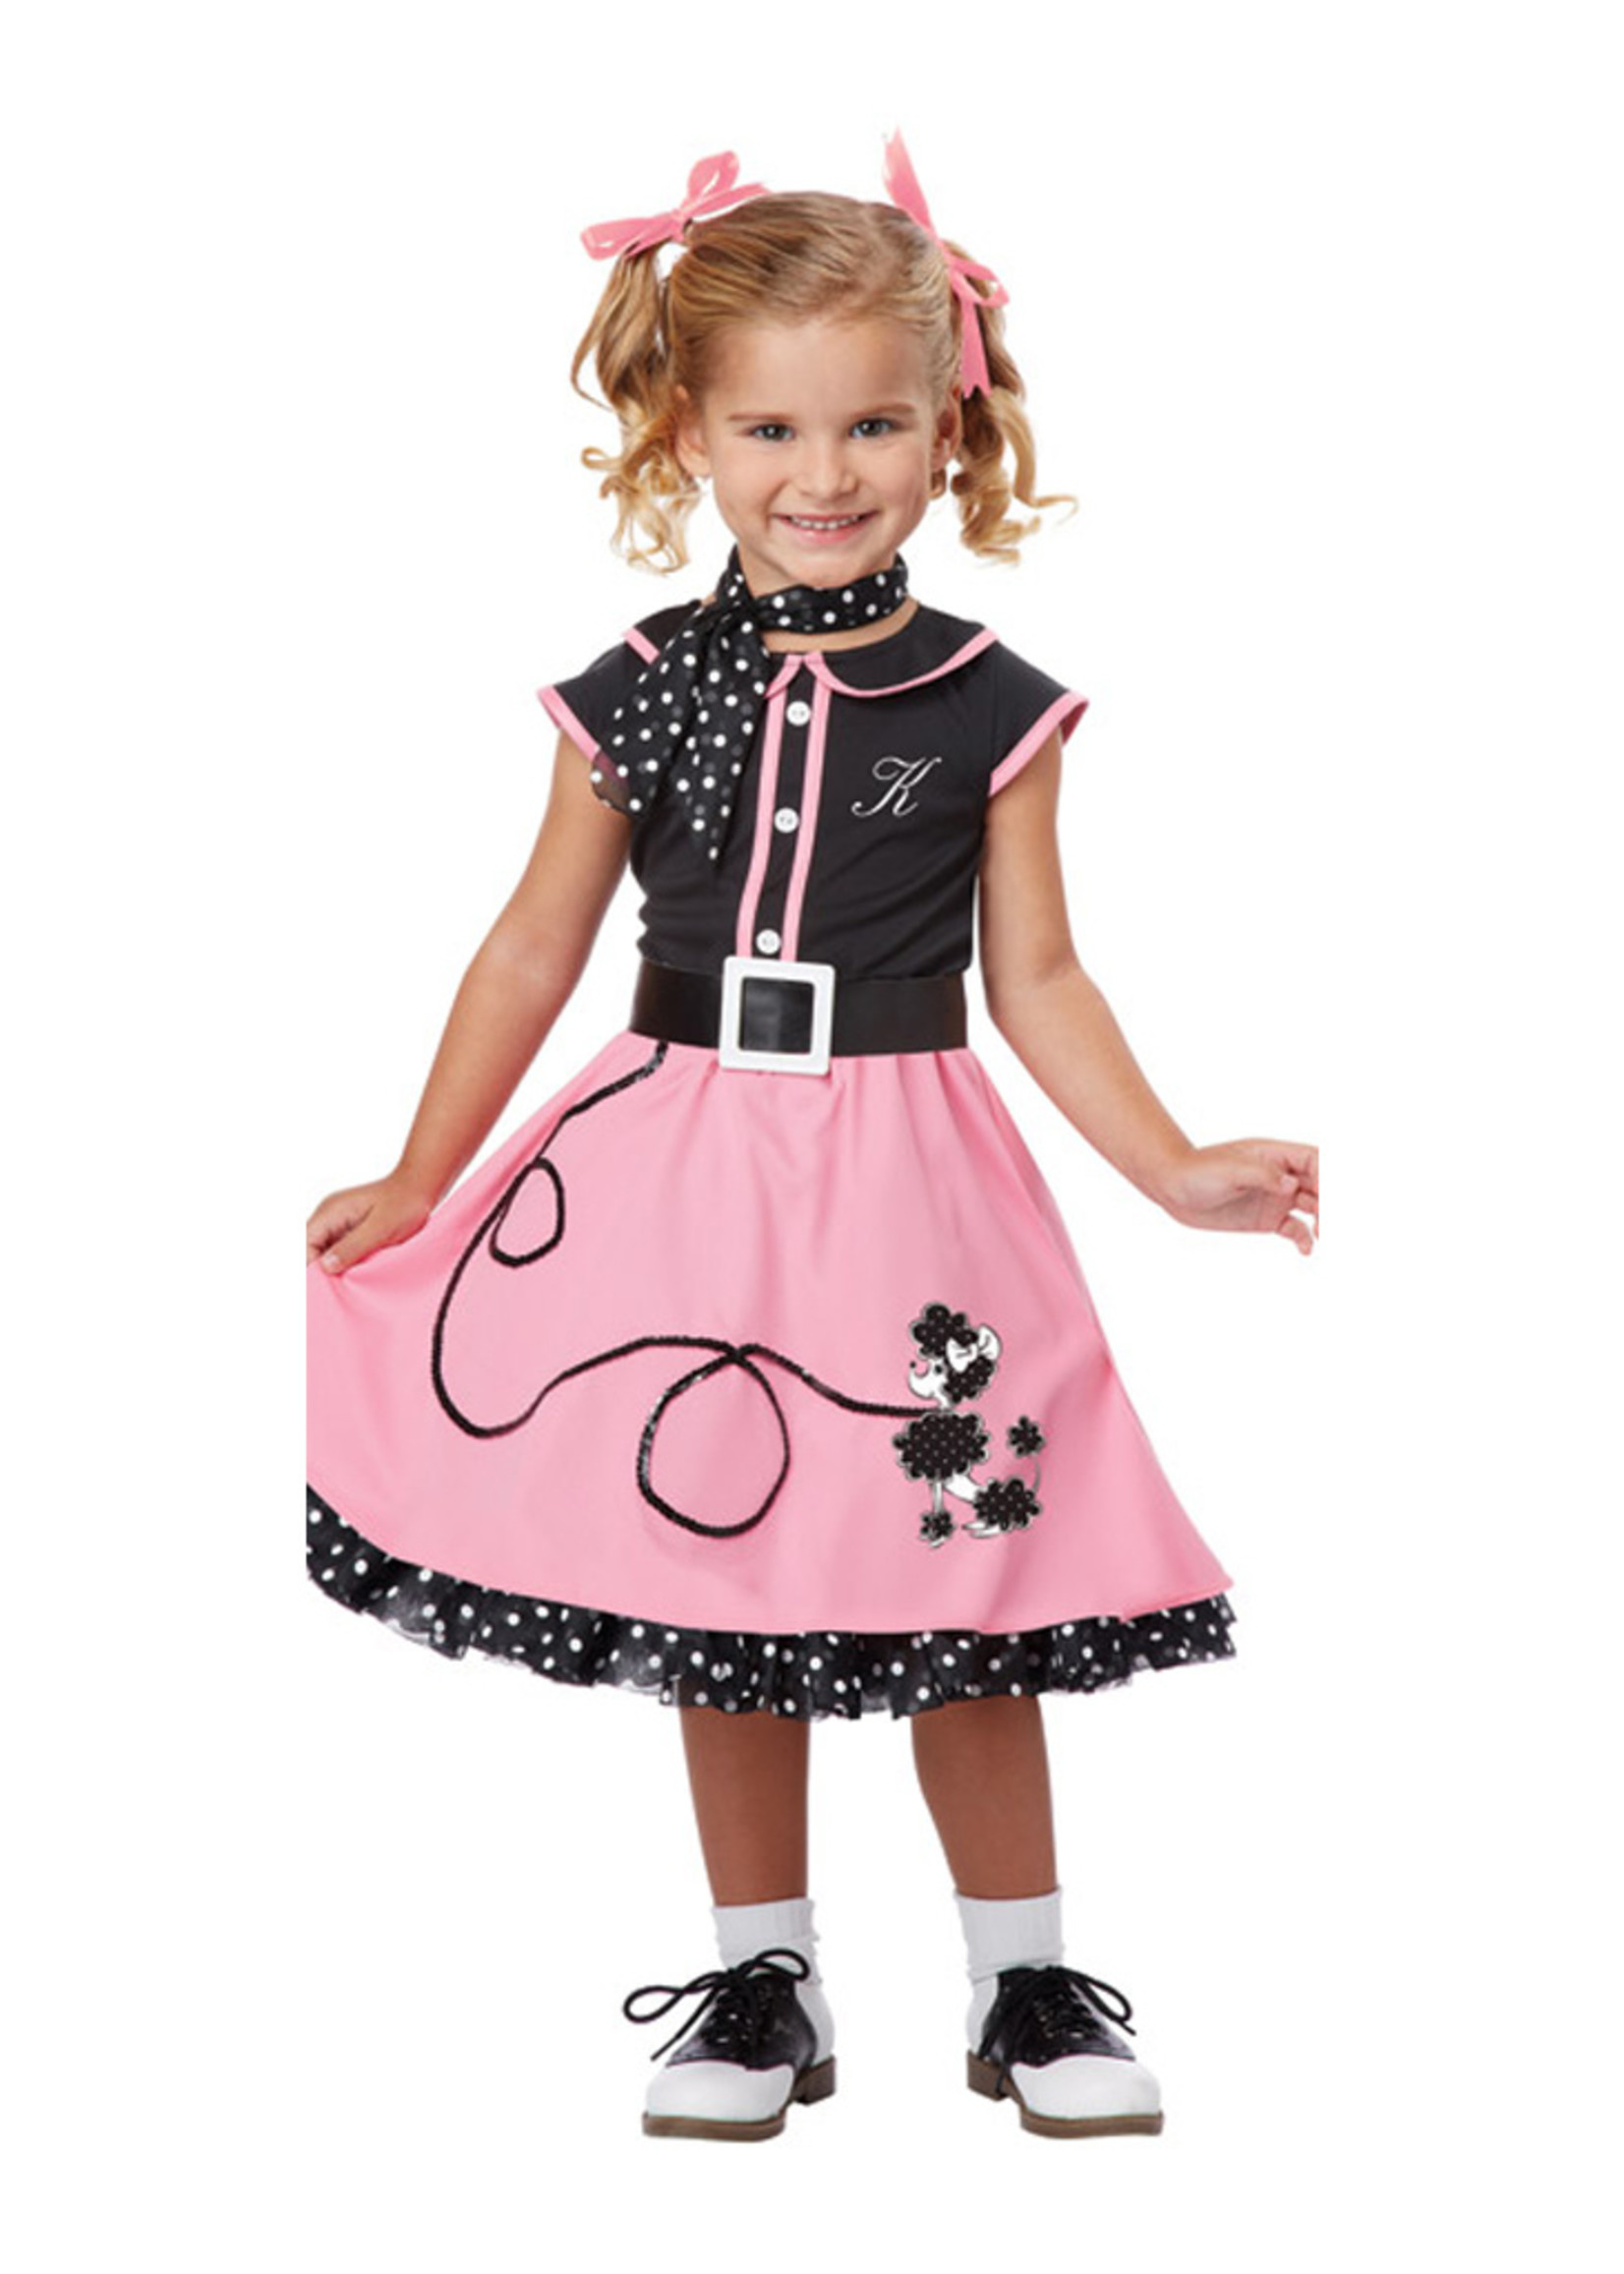 50's Poodle Cutie Costume - Toddler